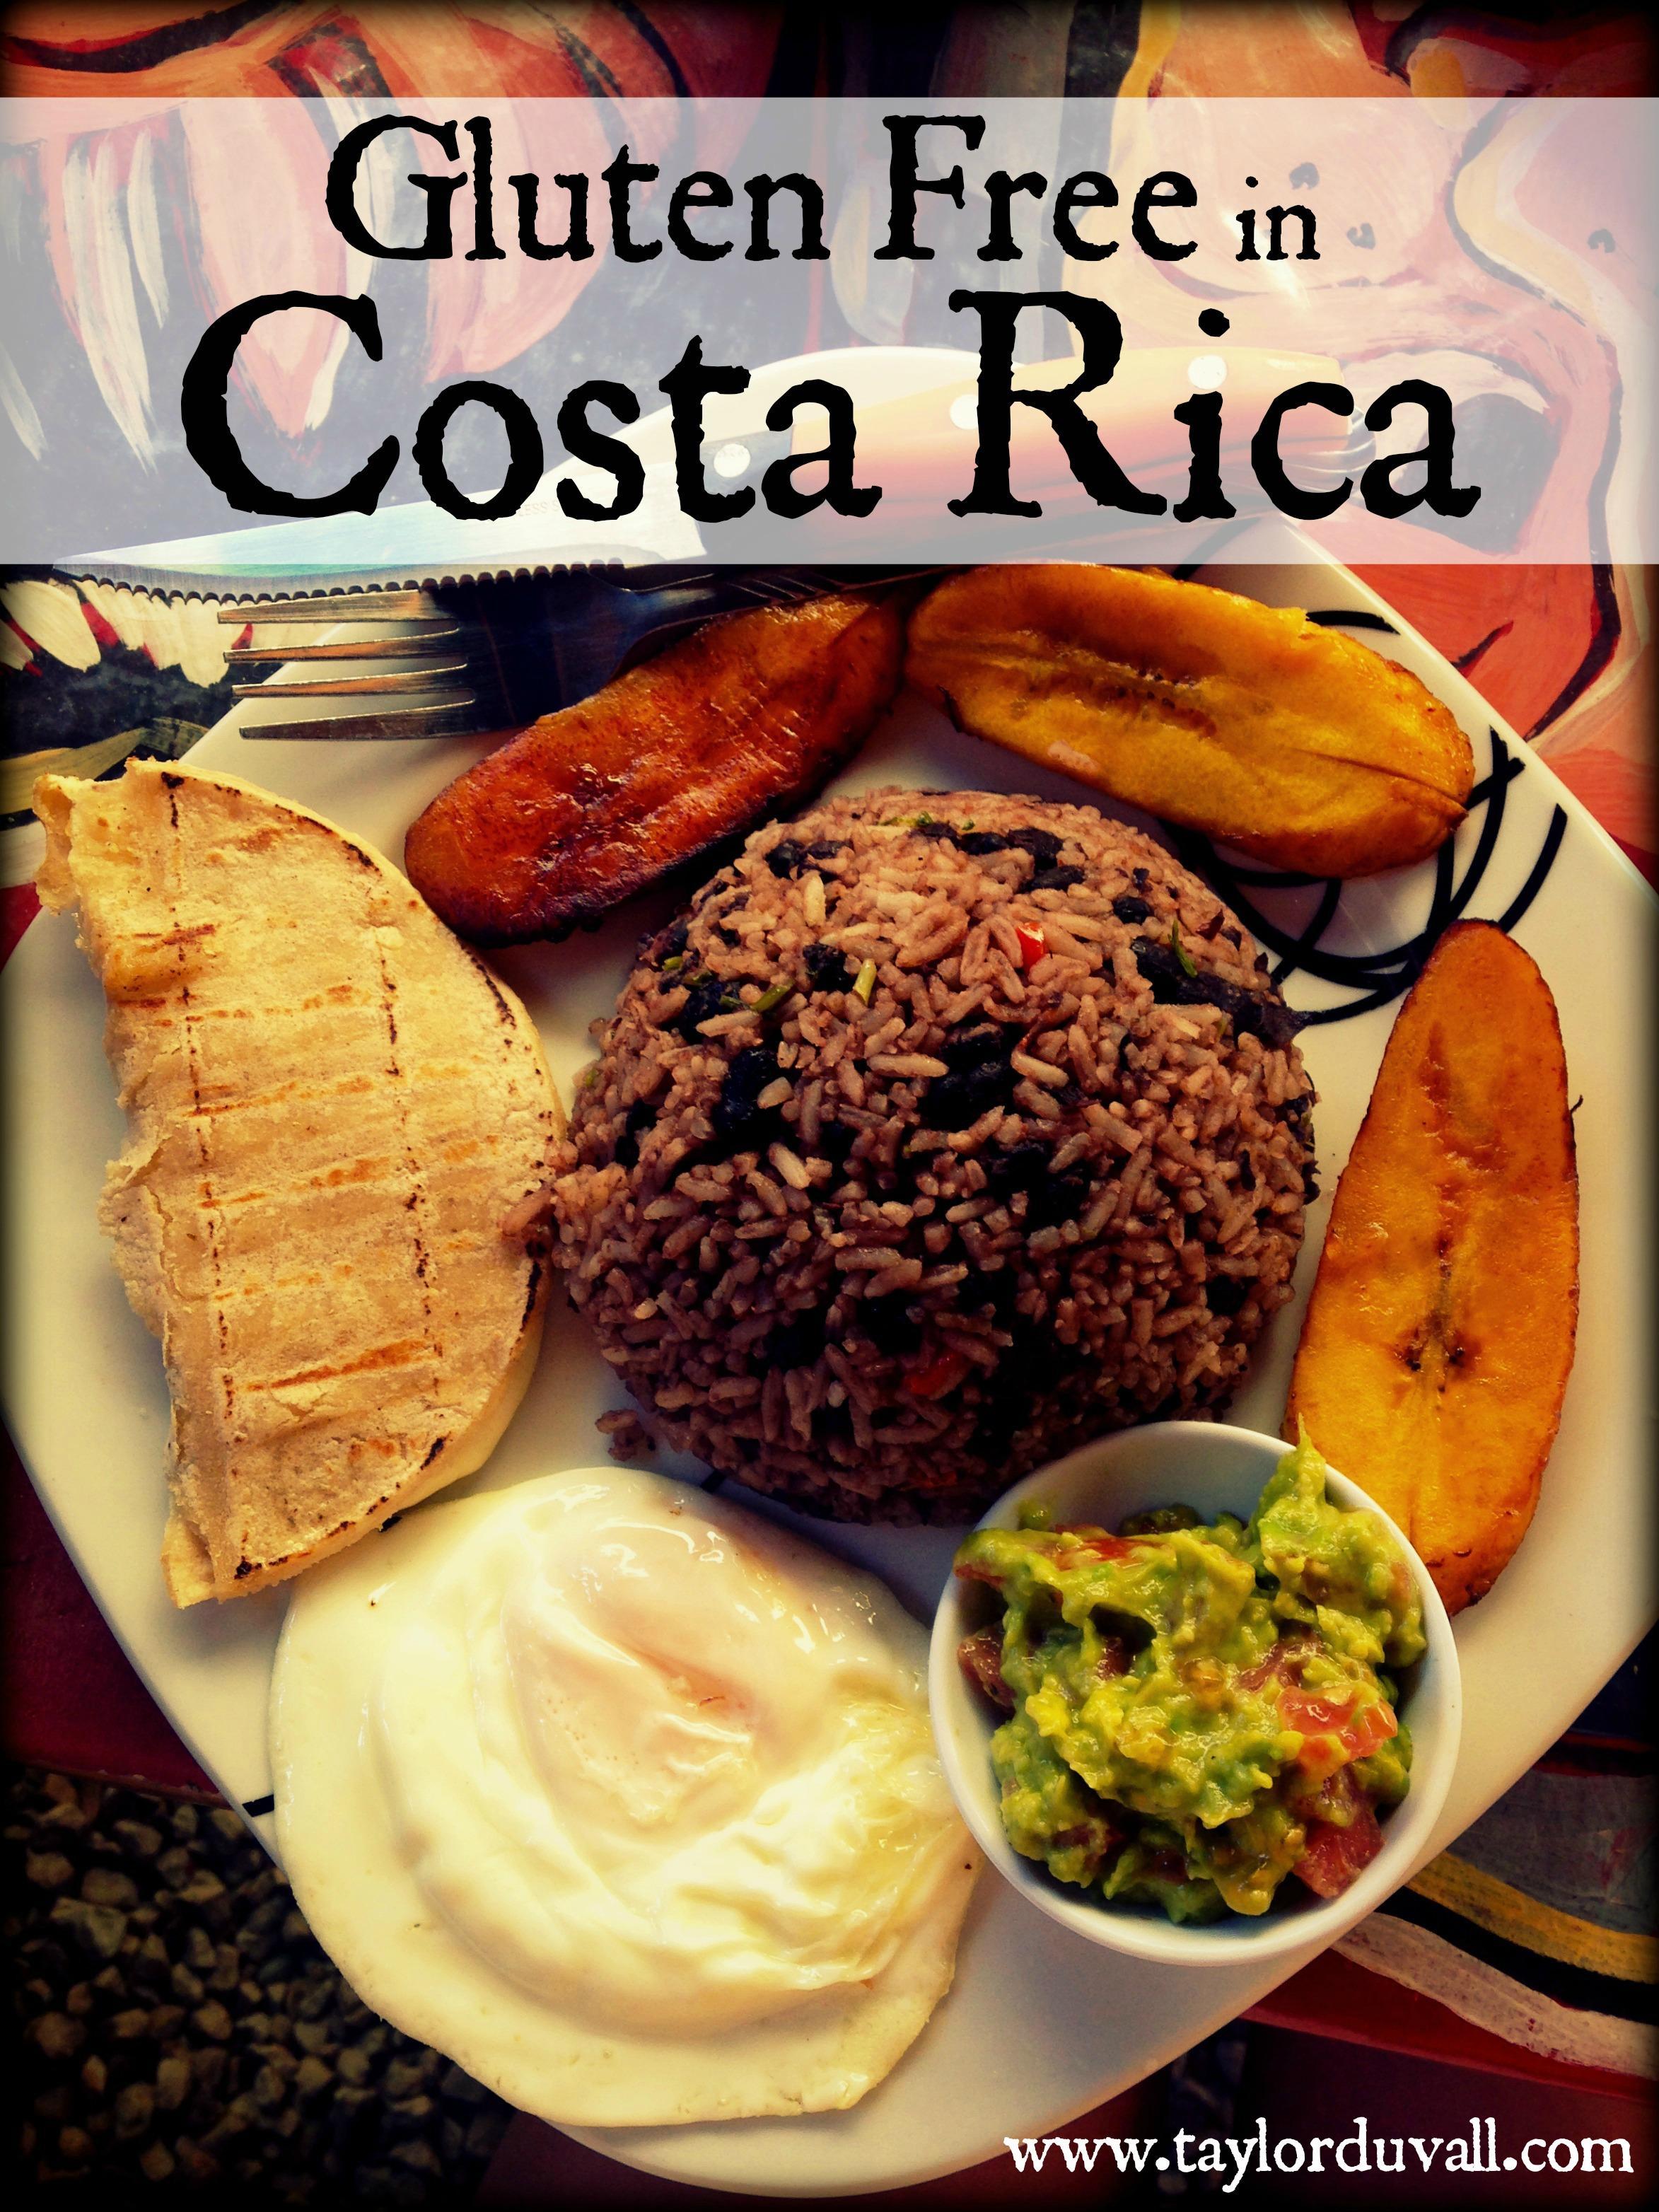 Gluten Free Costa Rica